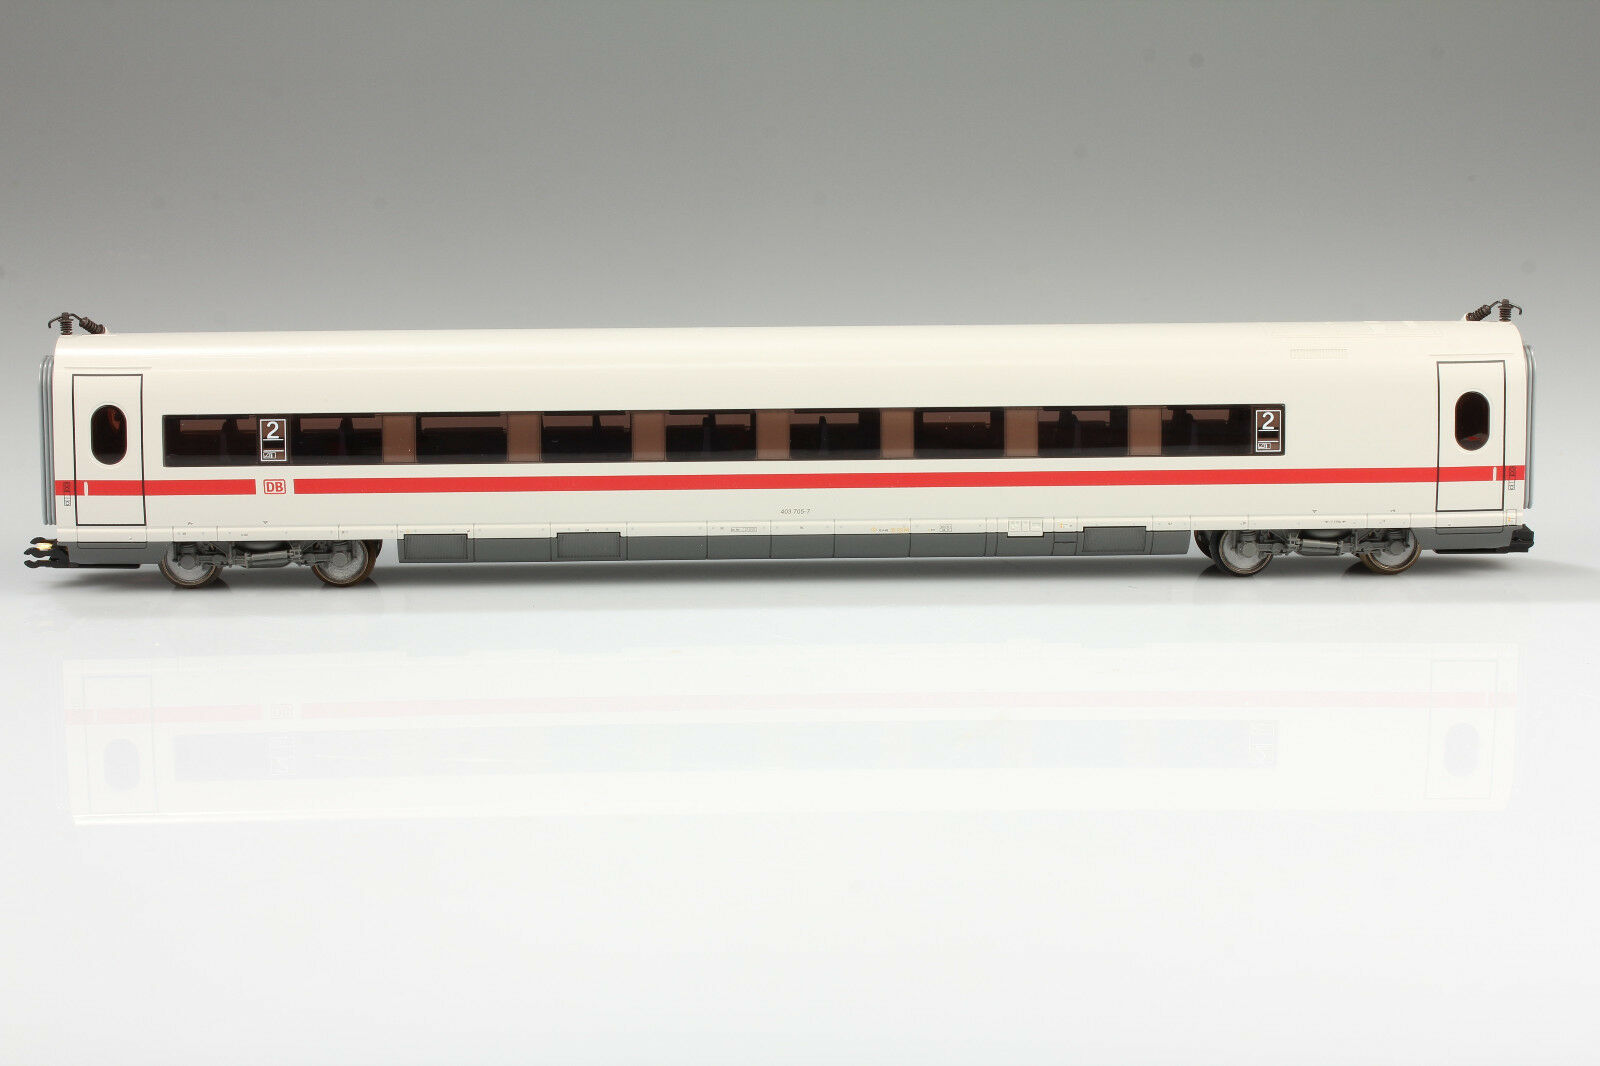 H0 Trix 23397 Ice Centre Wagon 403 705-7 Very Good Condition Ob